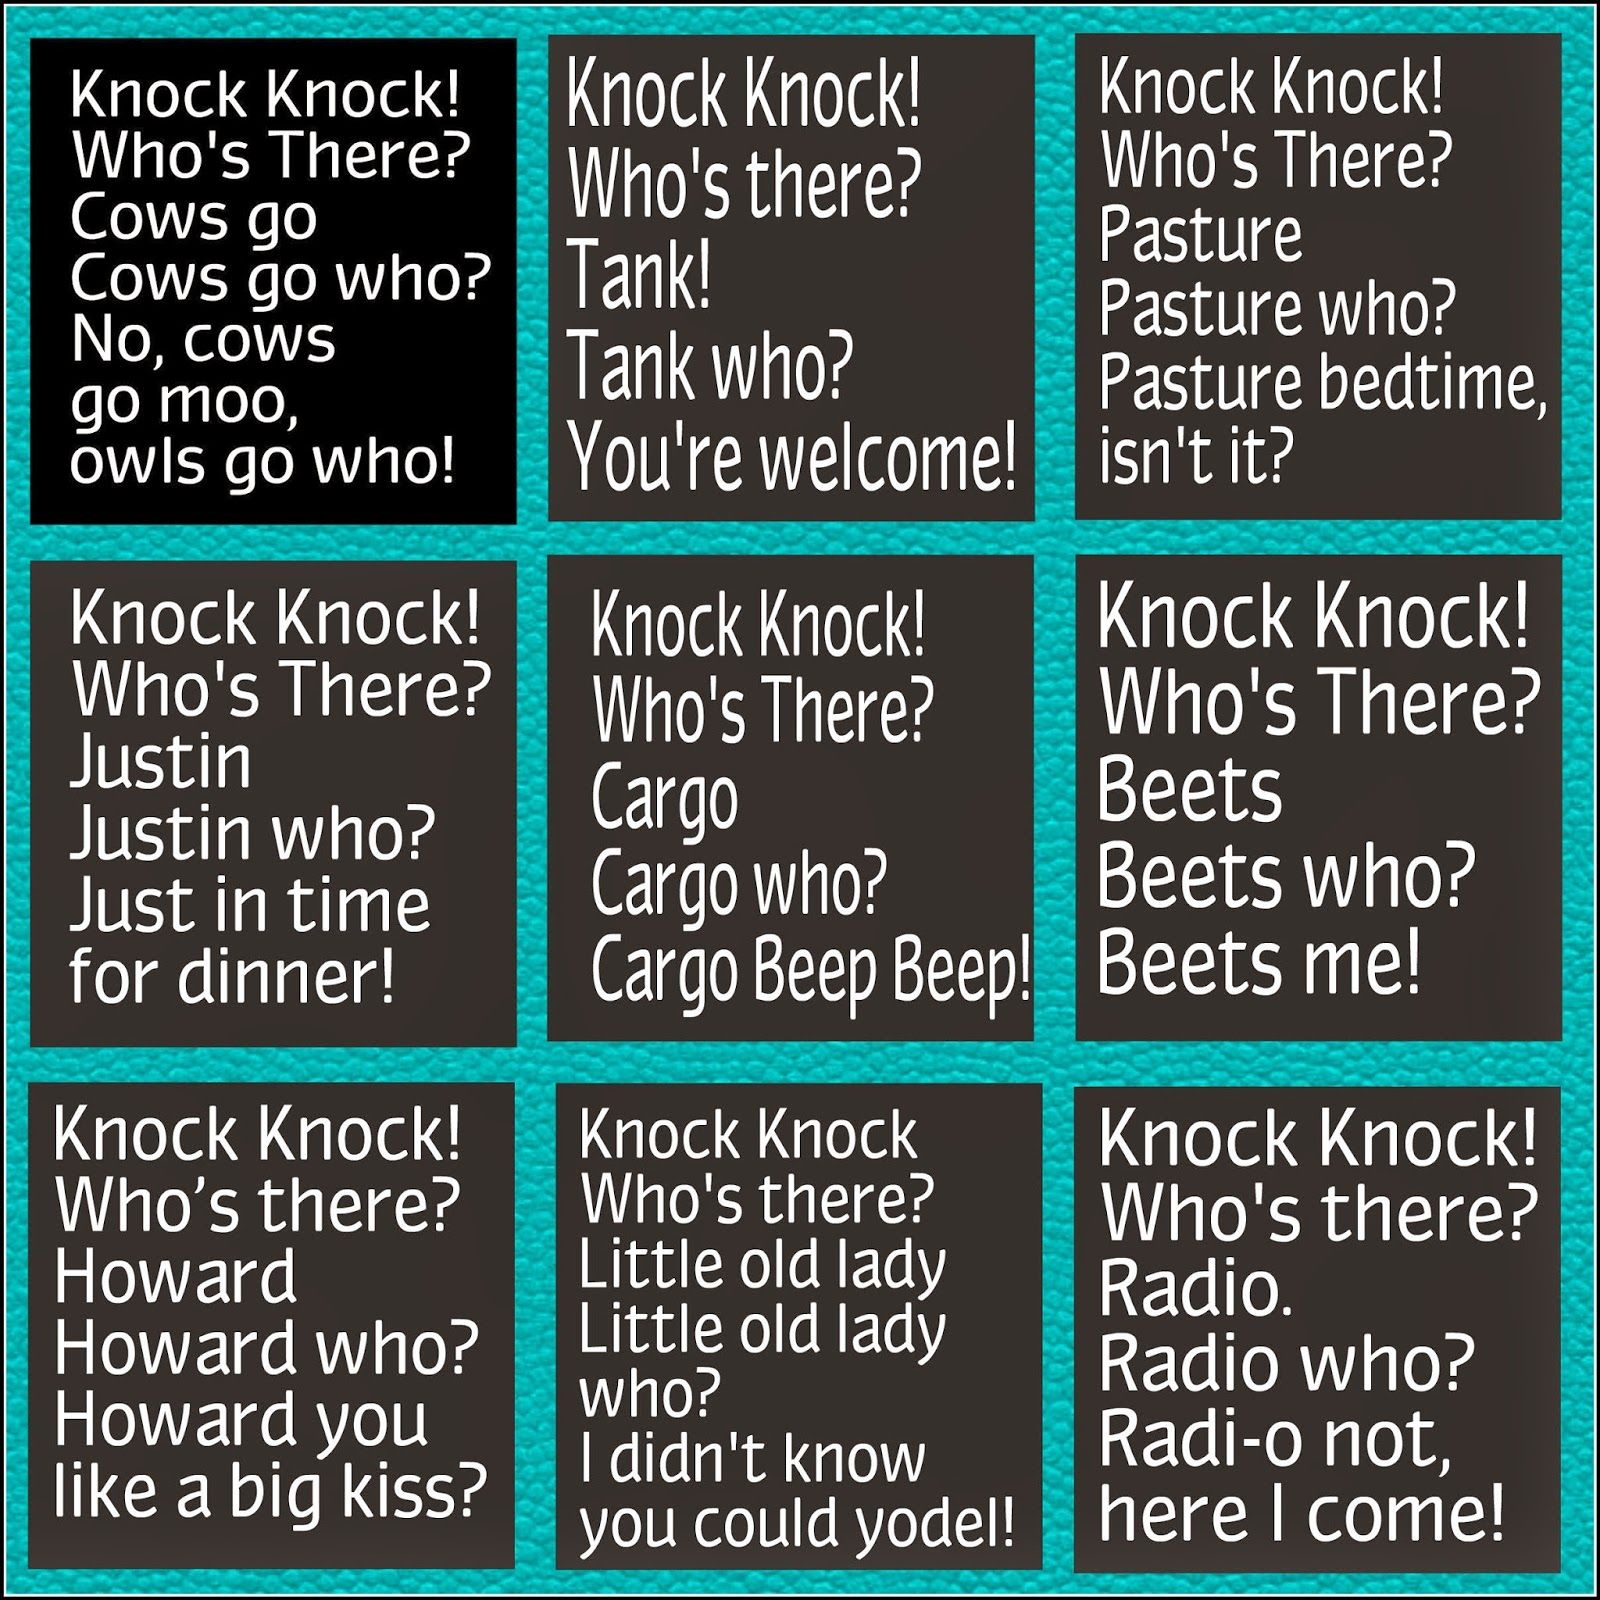 Knock Knock Jokes Funny Jokes For Kids Jokes For Kids Funny Knock Knock Jokes